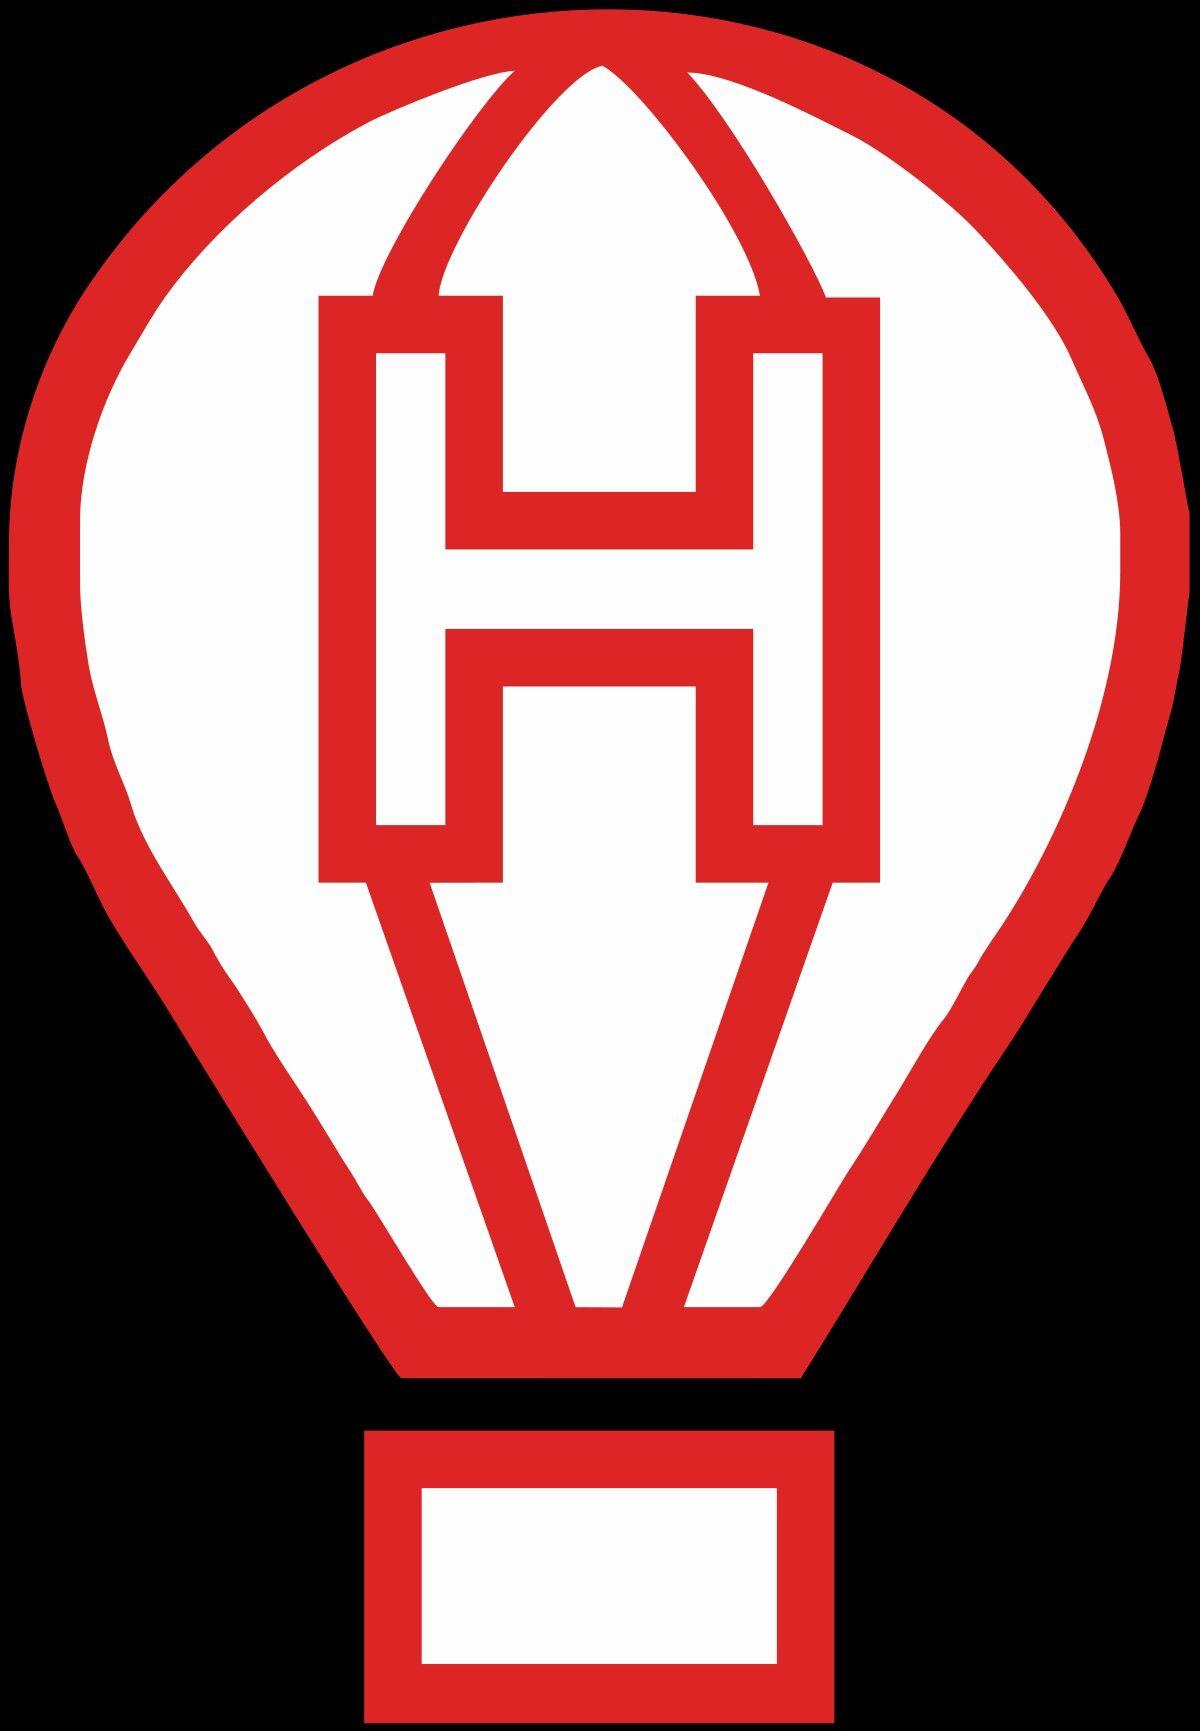 CA Huracan of Argentina crest. Sport team logos, Team